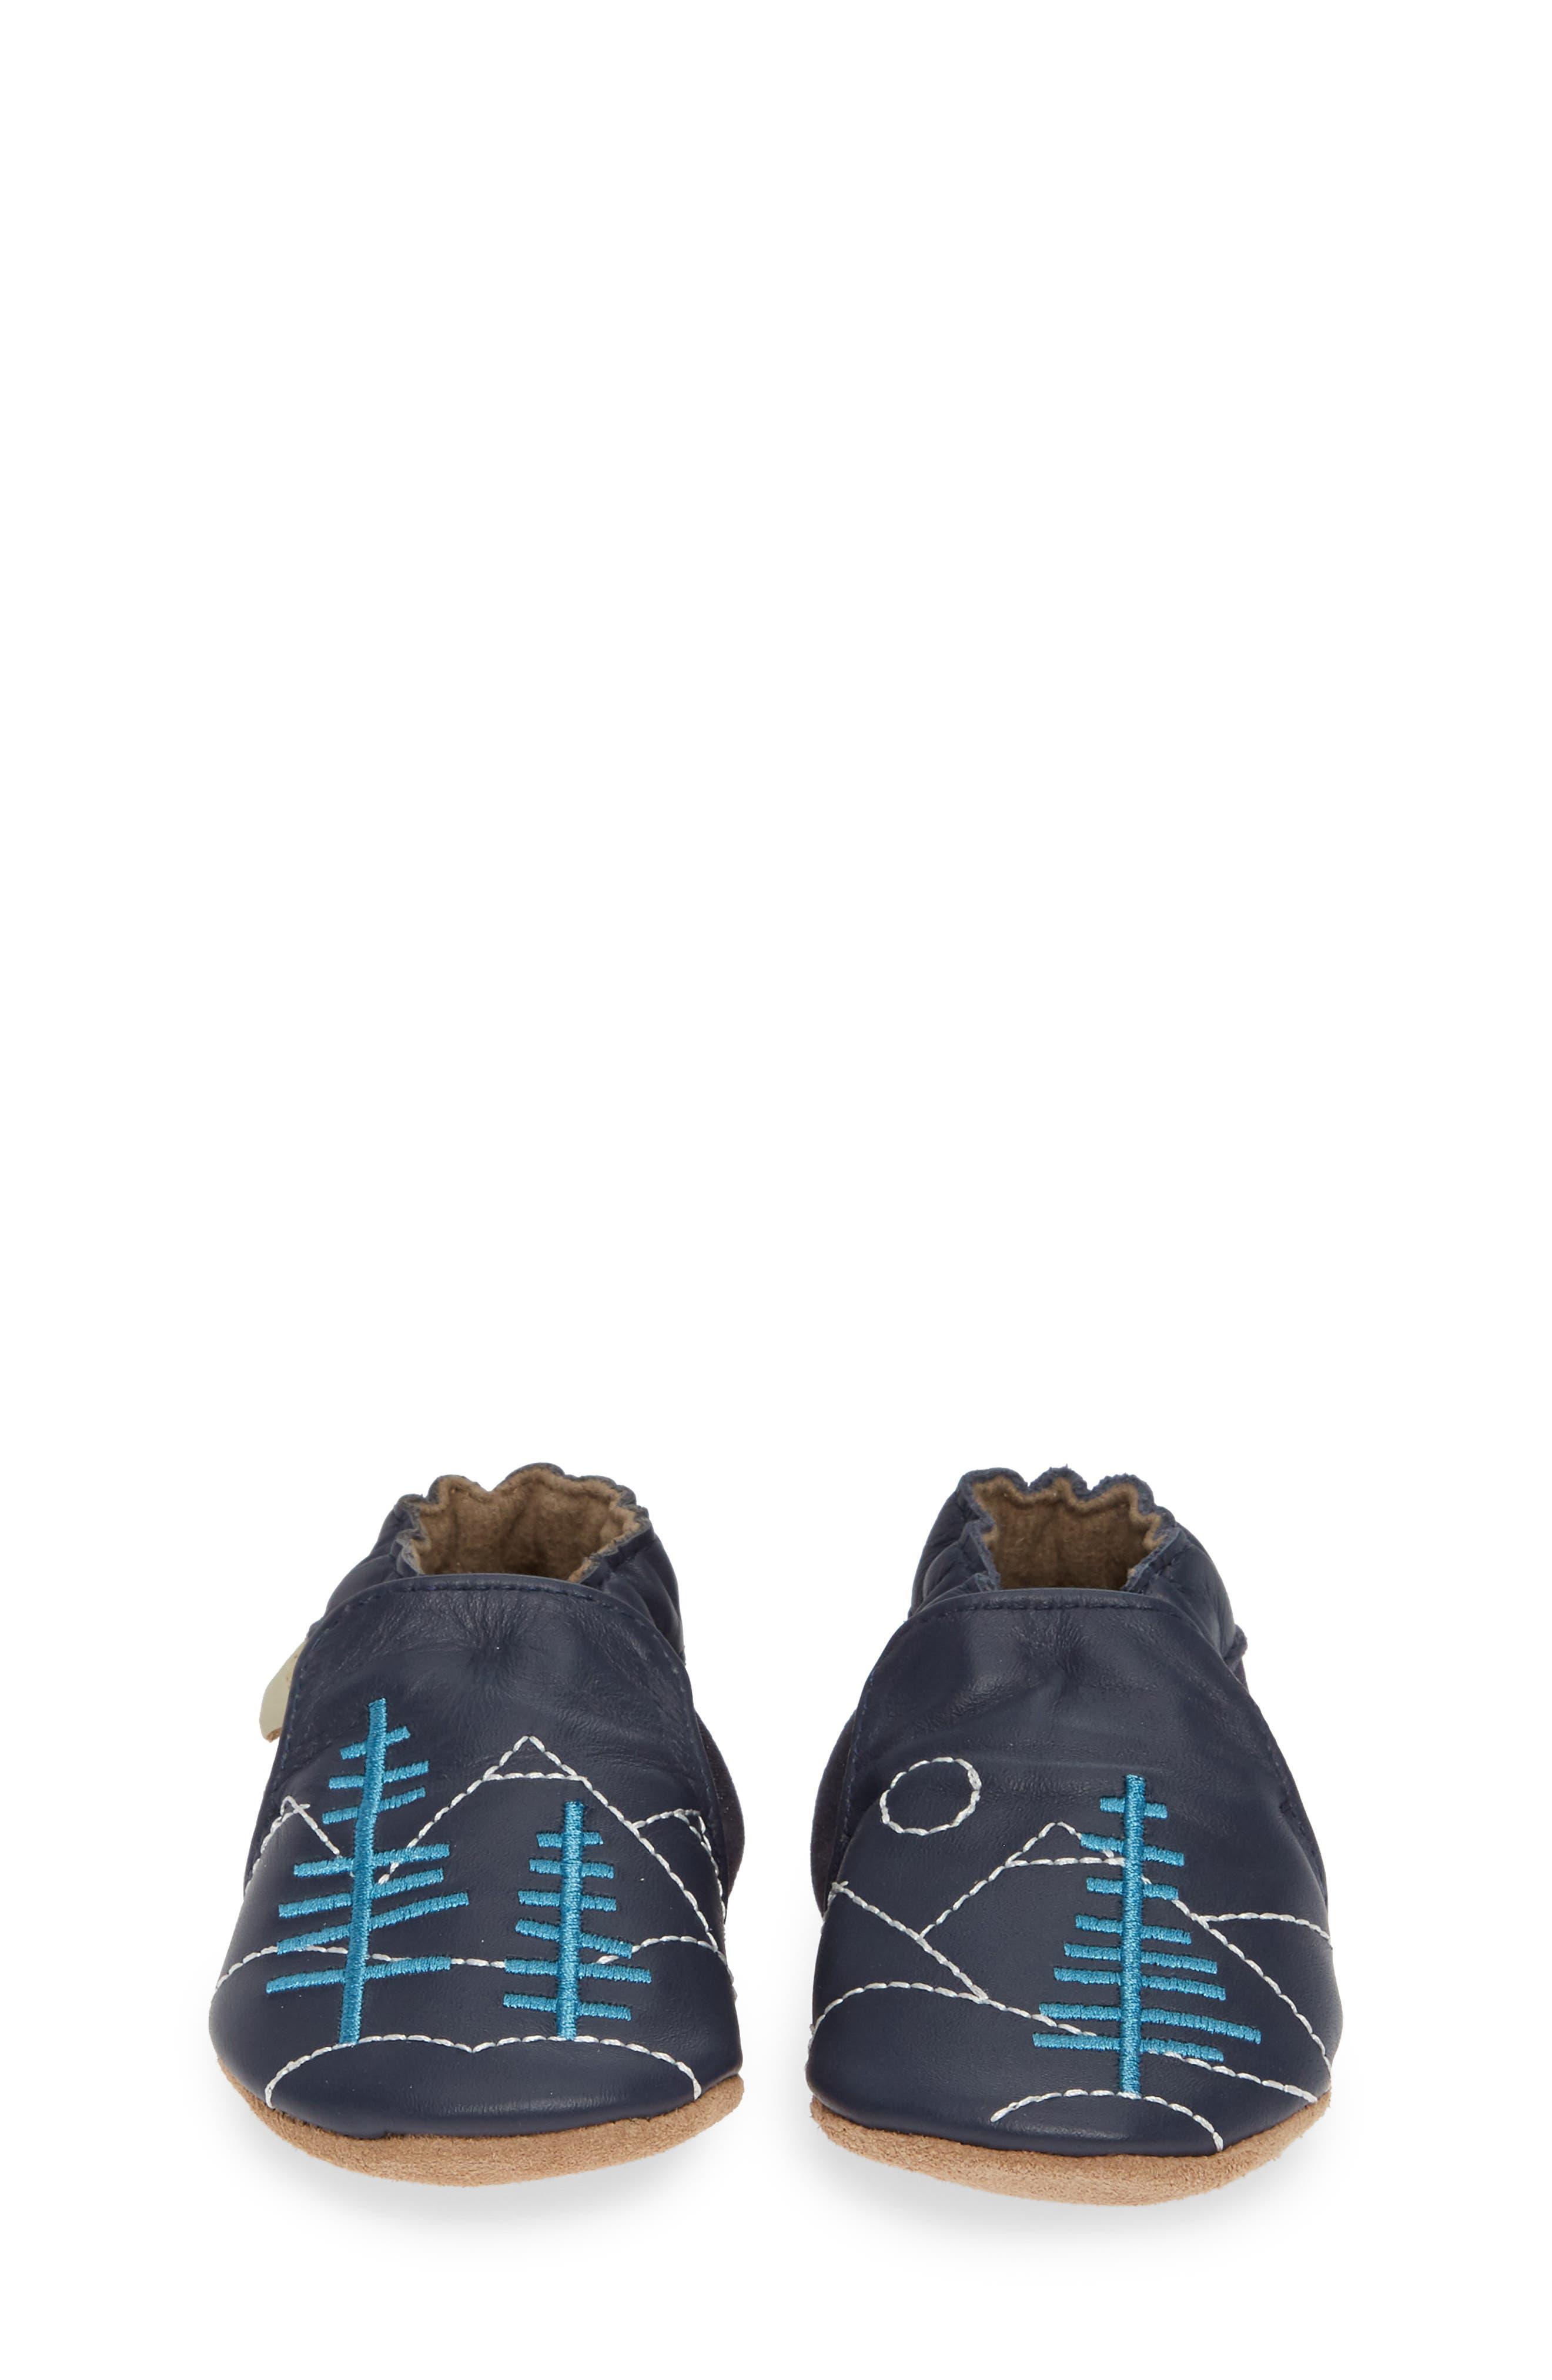 ROBEEZ<SUP>®</SUP>, Mountain Explorer Moccasin Crib Shoe, Alternate thumbnail 5, color, NAVY